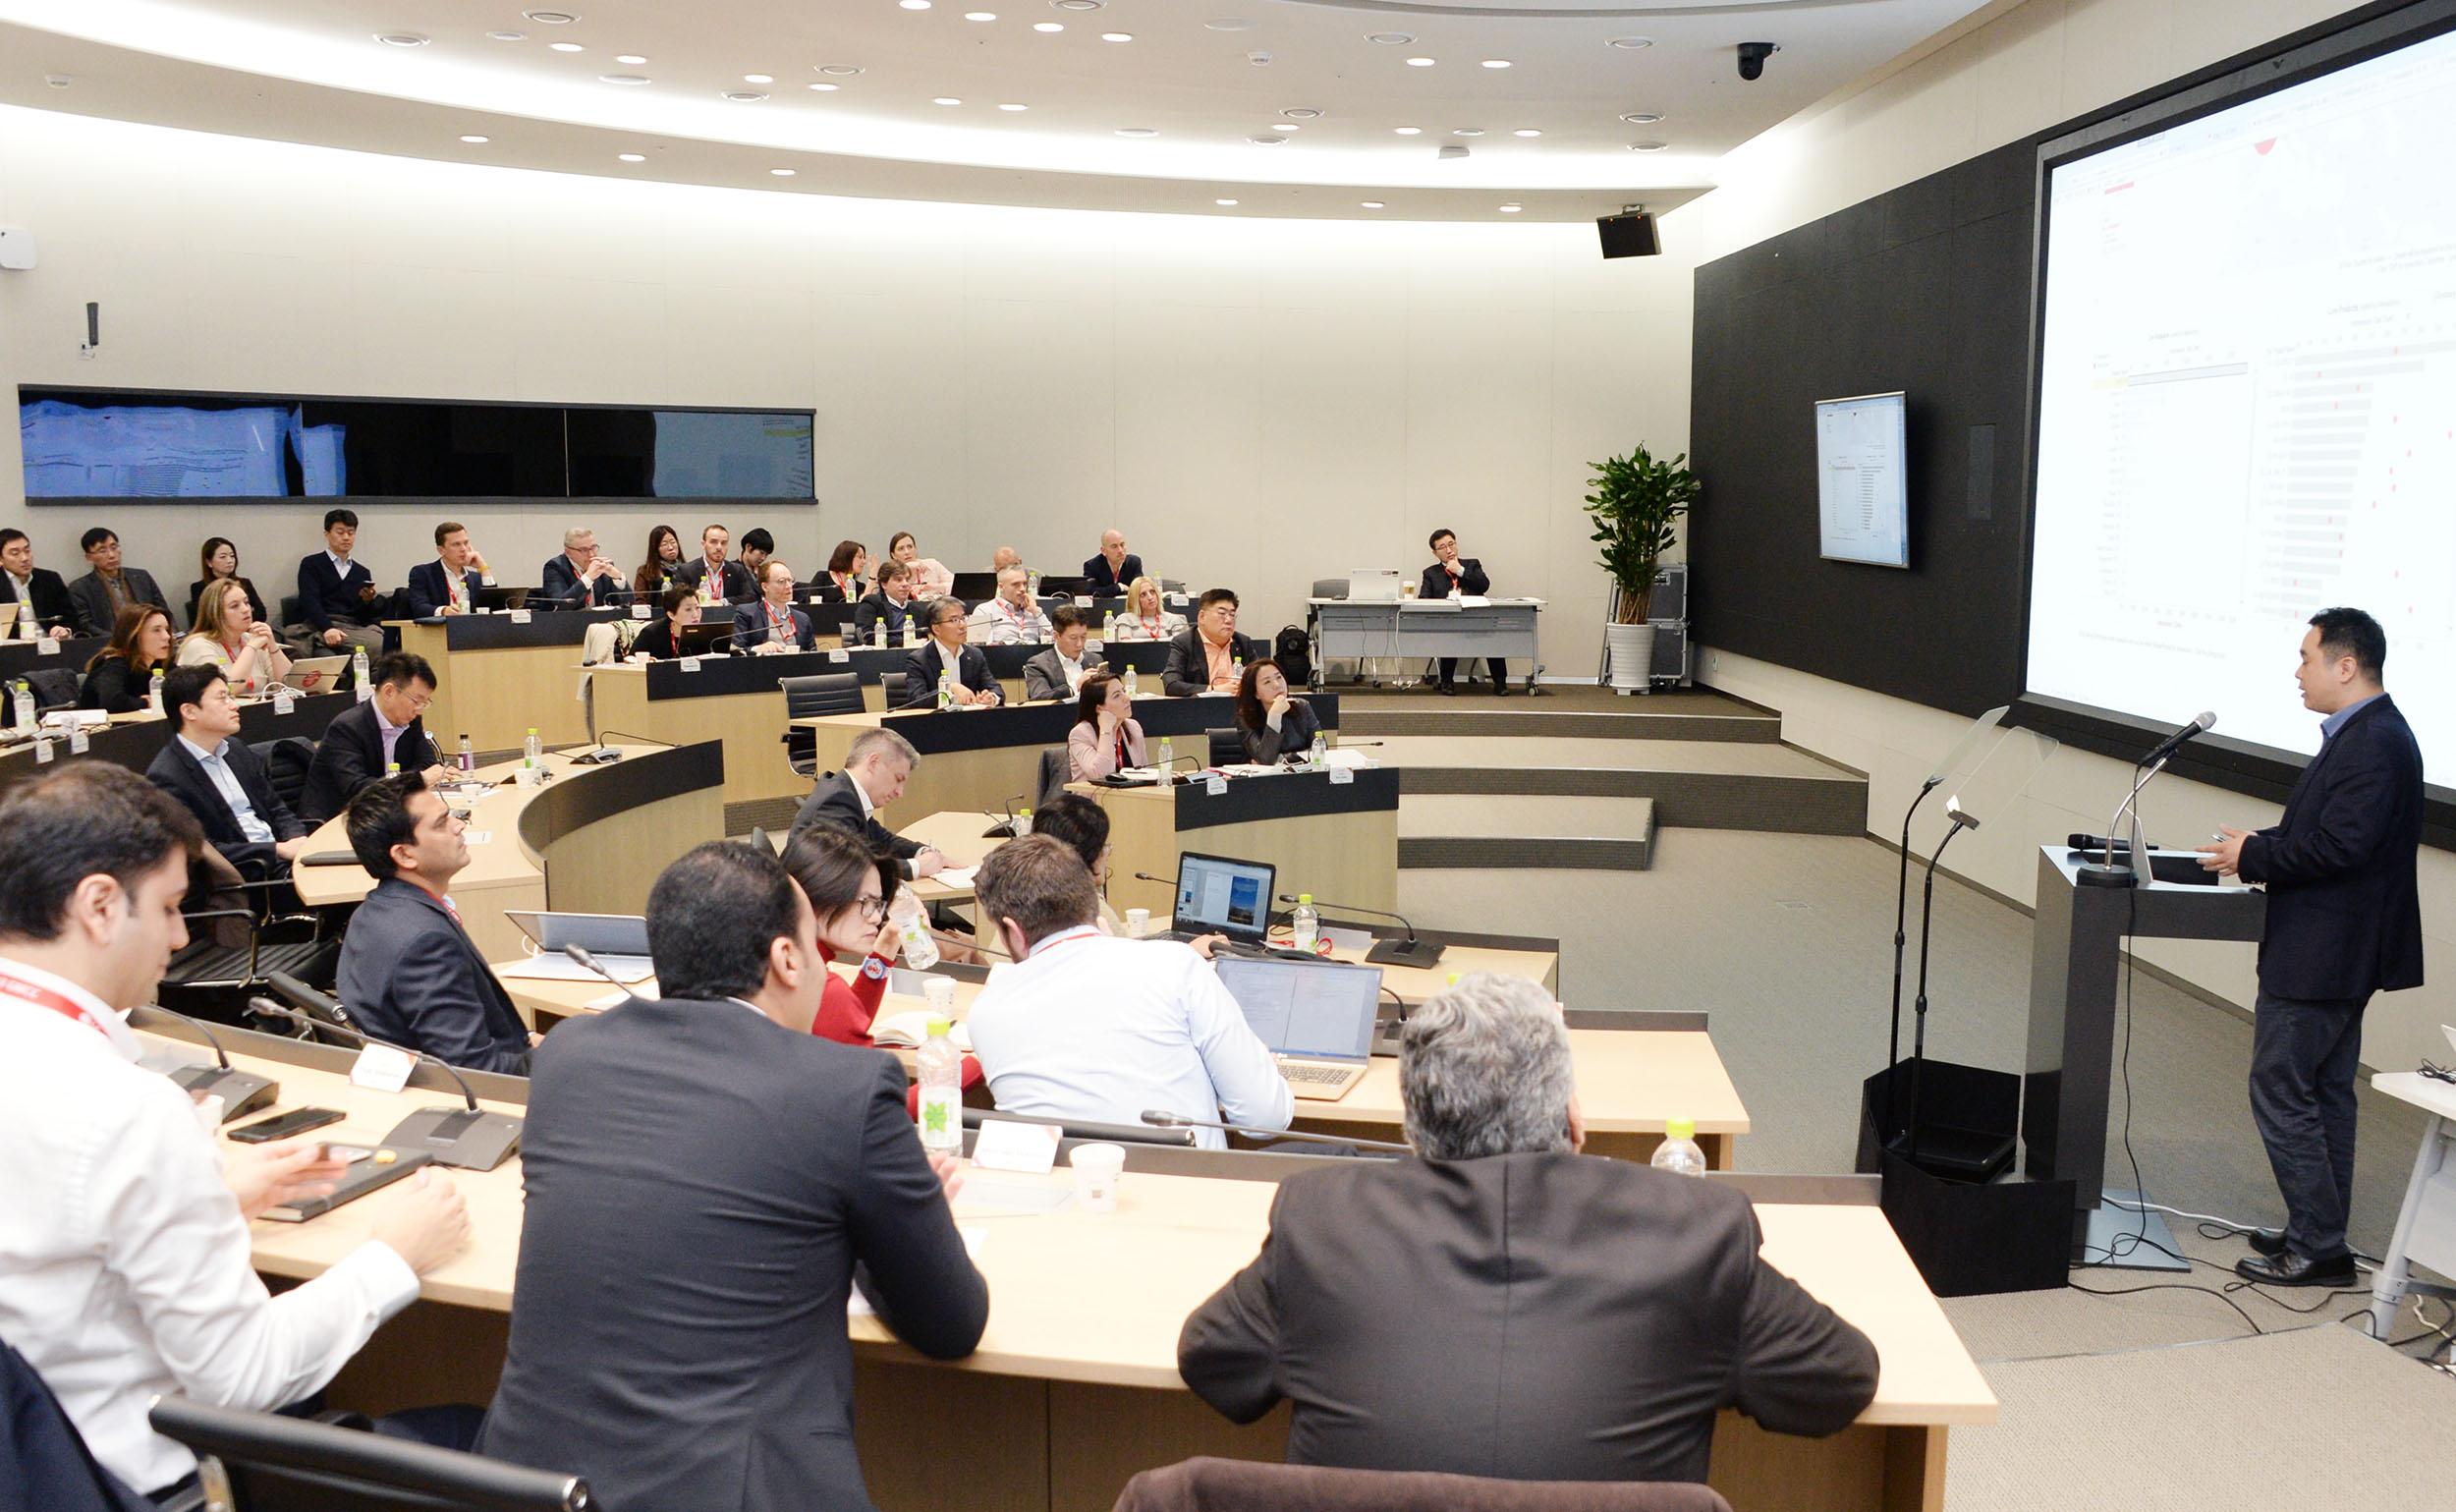 LG전자는 LG마곡사이언스파크에서 30여 해외법인의 마케터 약 100명이 참석한 가운데 '글로벌 마케팅 커뮤니케이션 컨퍼런스 (GMCC; Global Marketing Communication Conference)'를 진행했다.